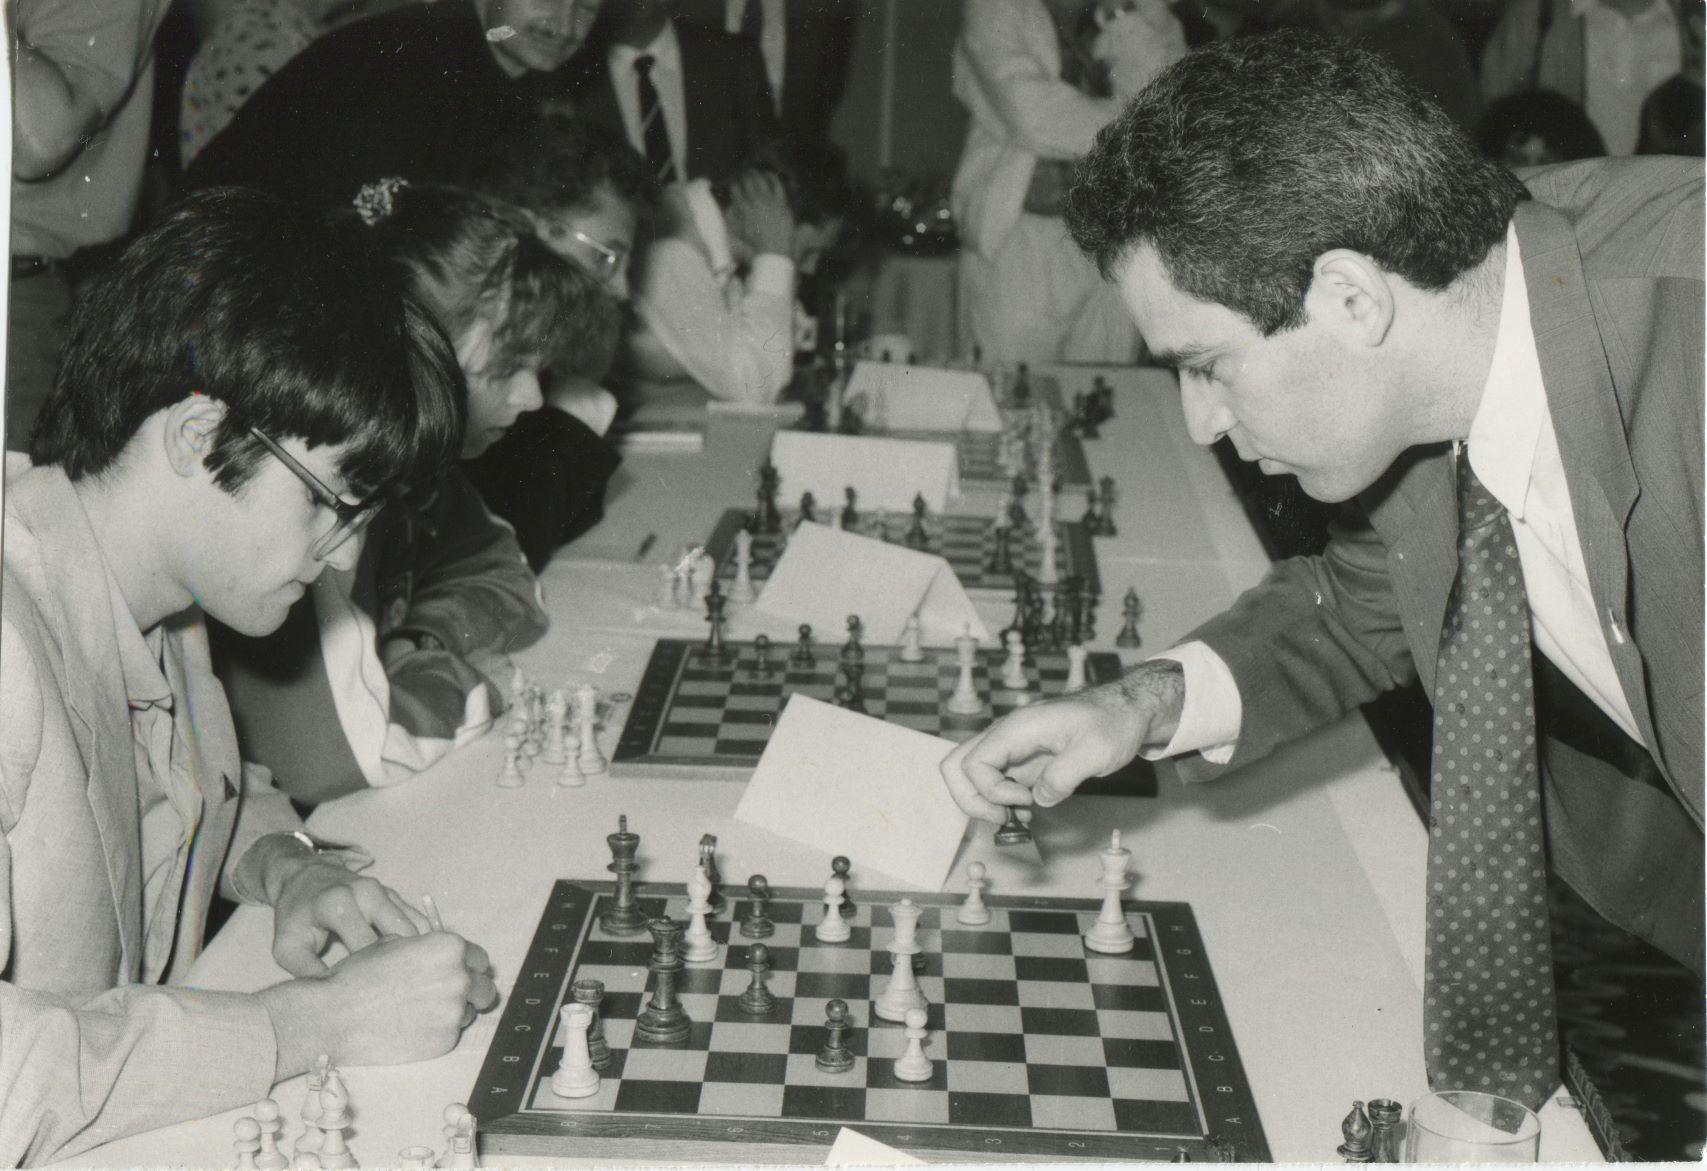 Kaim Piotr – Kasparov Symul W-wa 1991